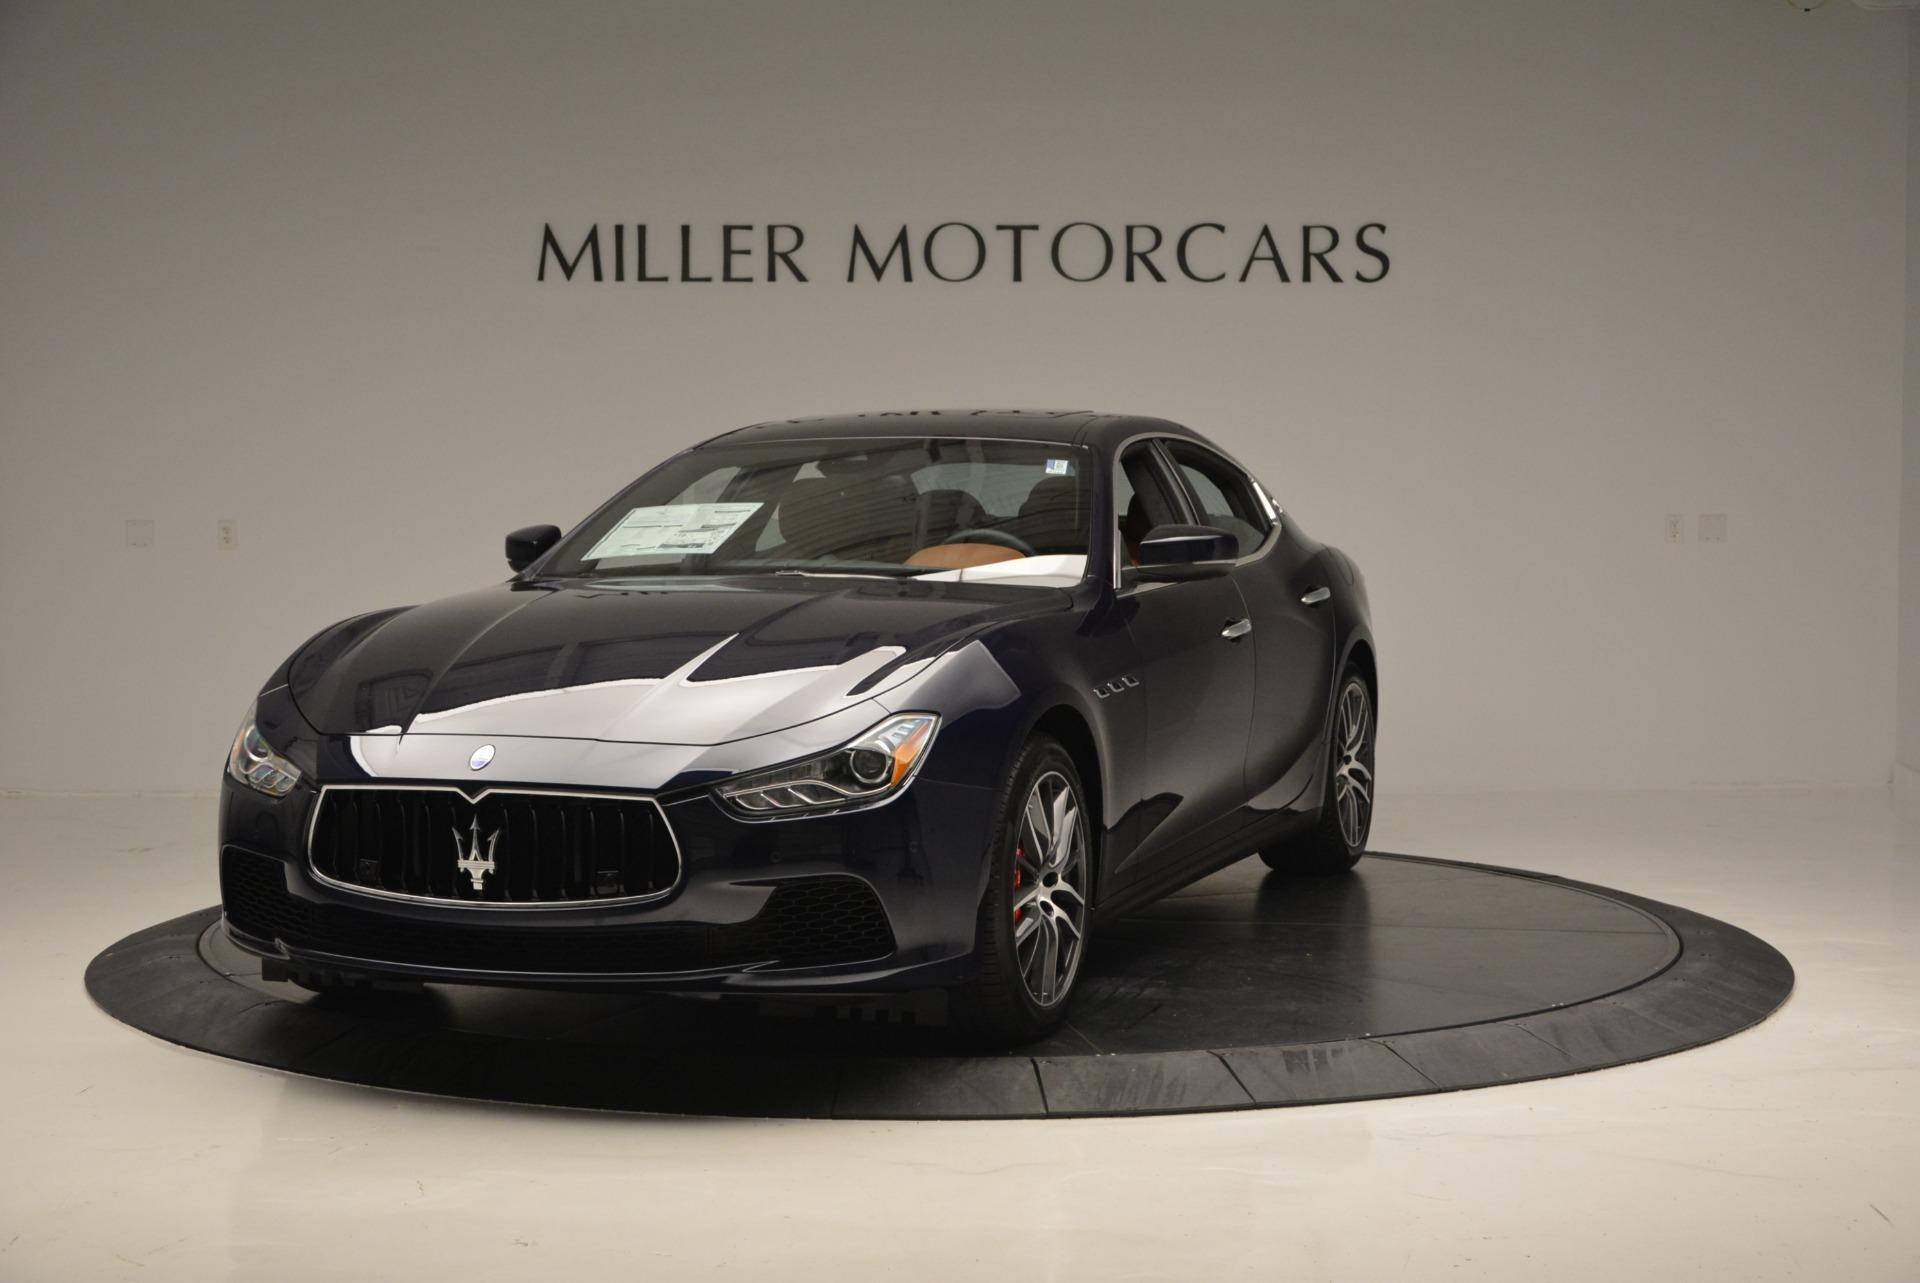 Used 2017 Maserati Ghibli S Q4 for sale $44,900 at Maserati of Greenwich in Greenwich CT 06830 1